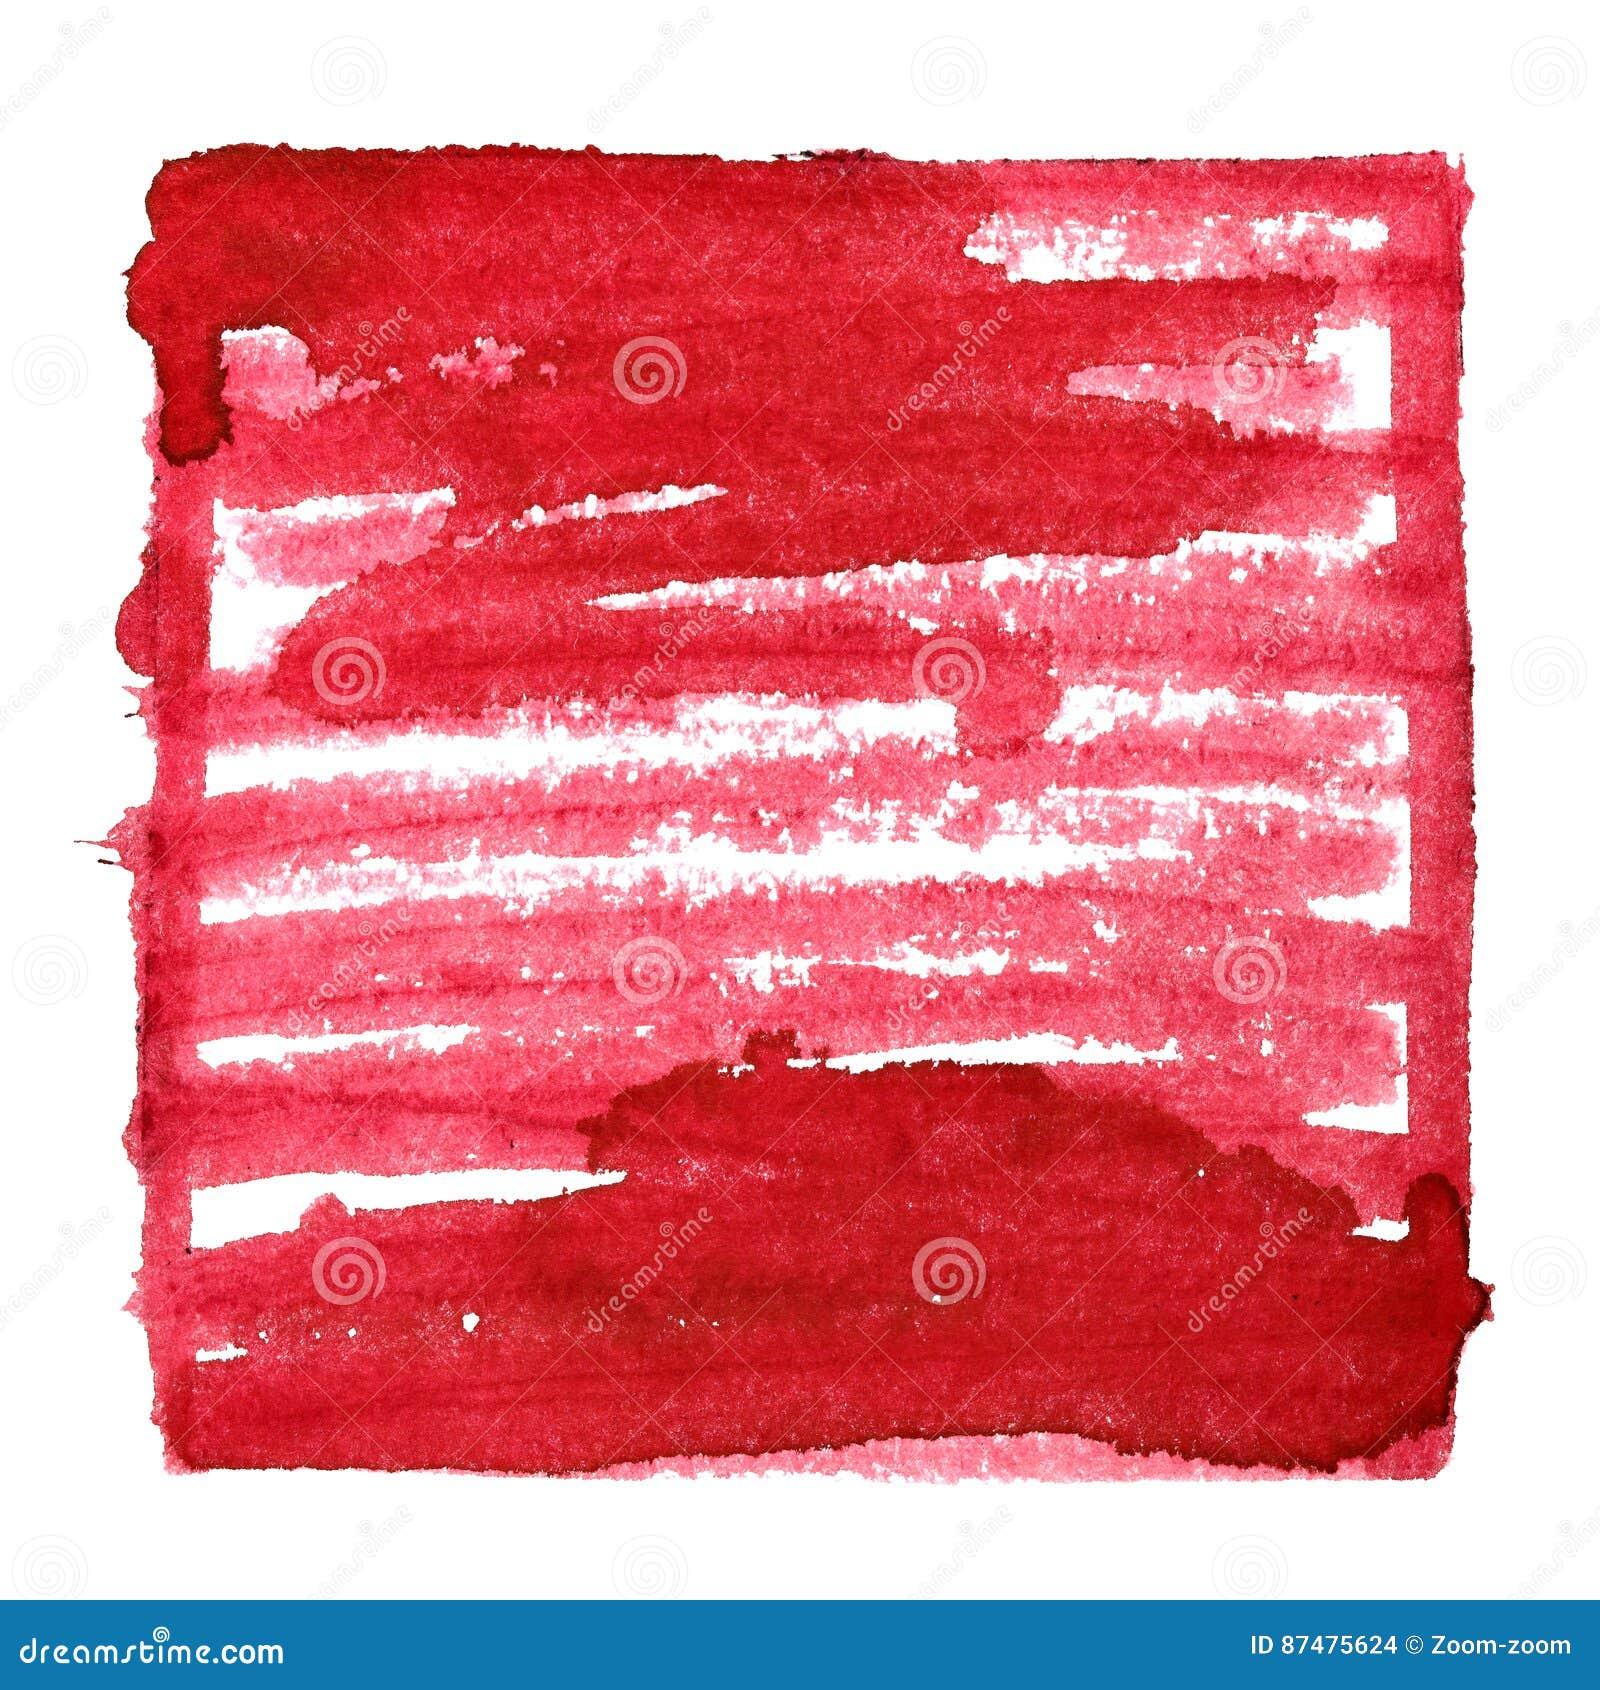 Красная абстрактная предпосылка с рамкой и shading